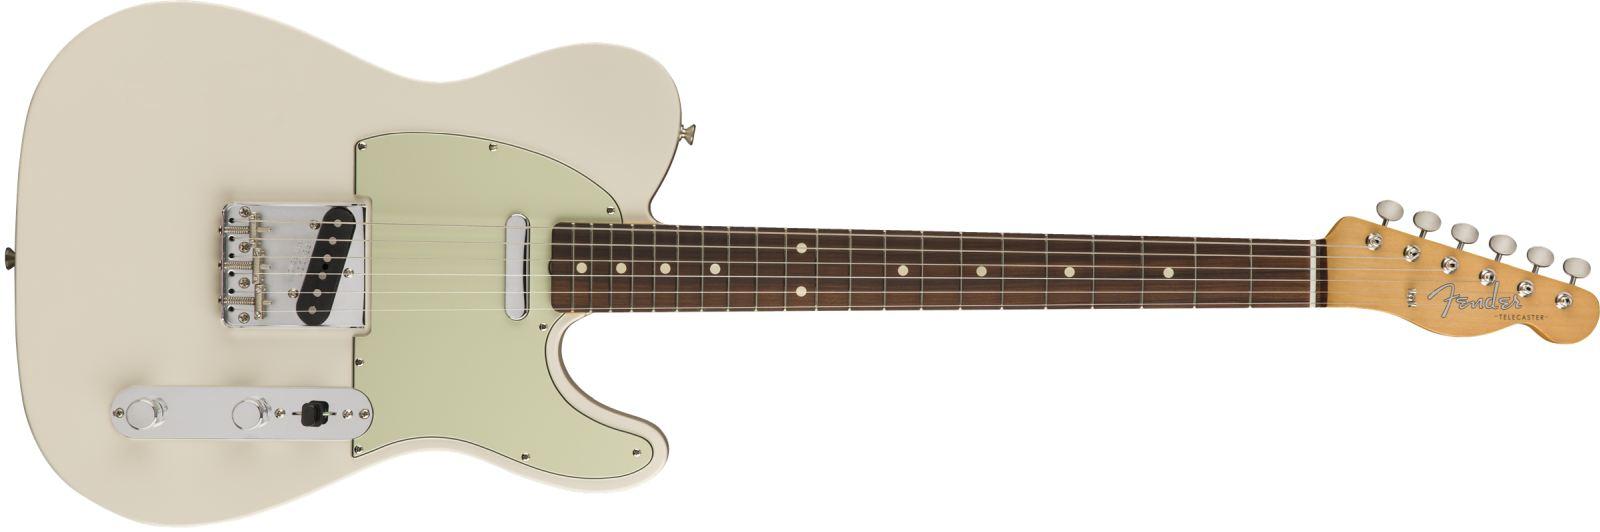 Fender 60 Classic Telecaster PF OW